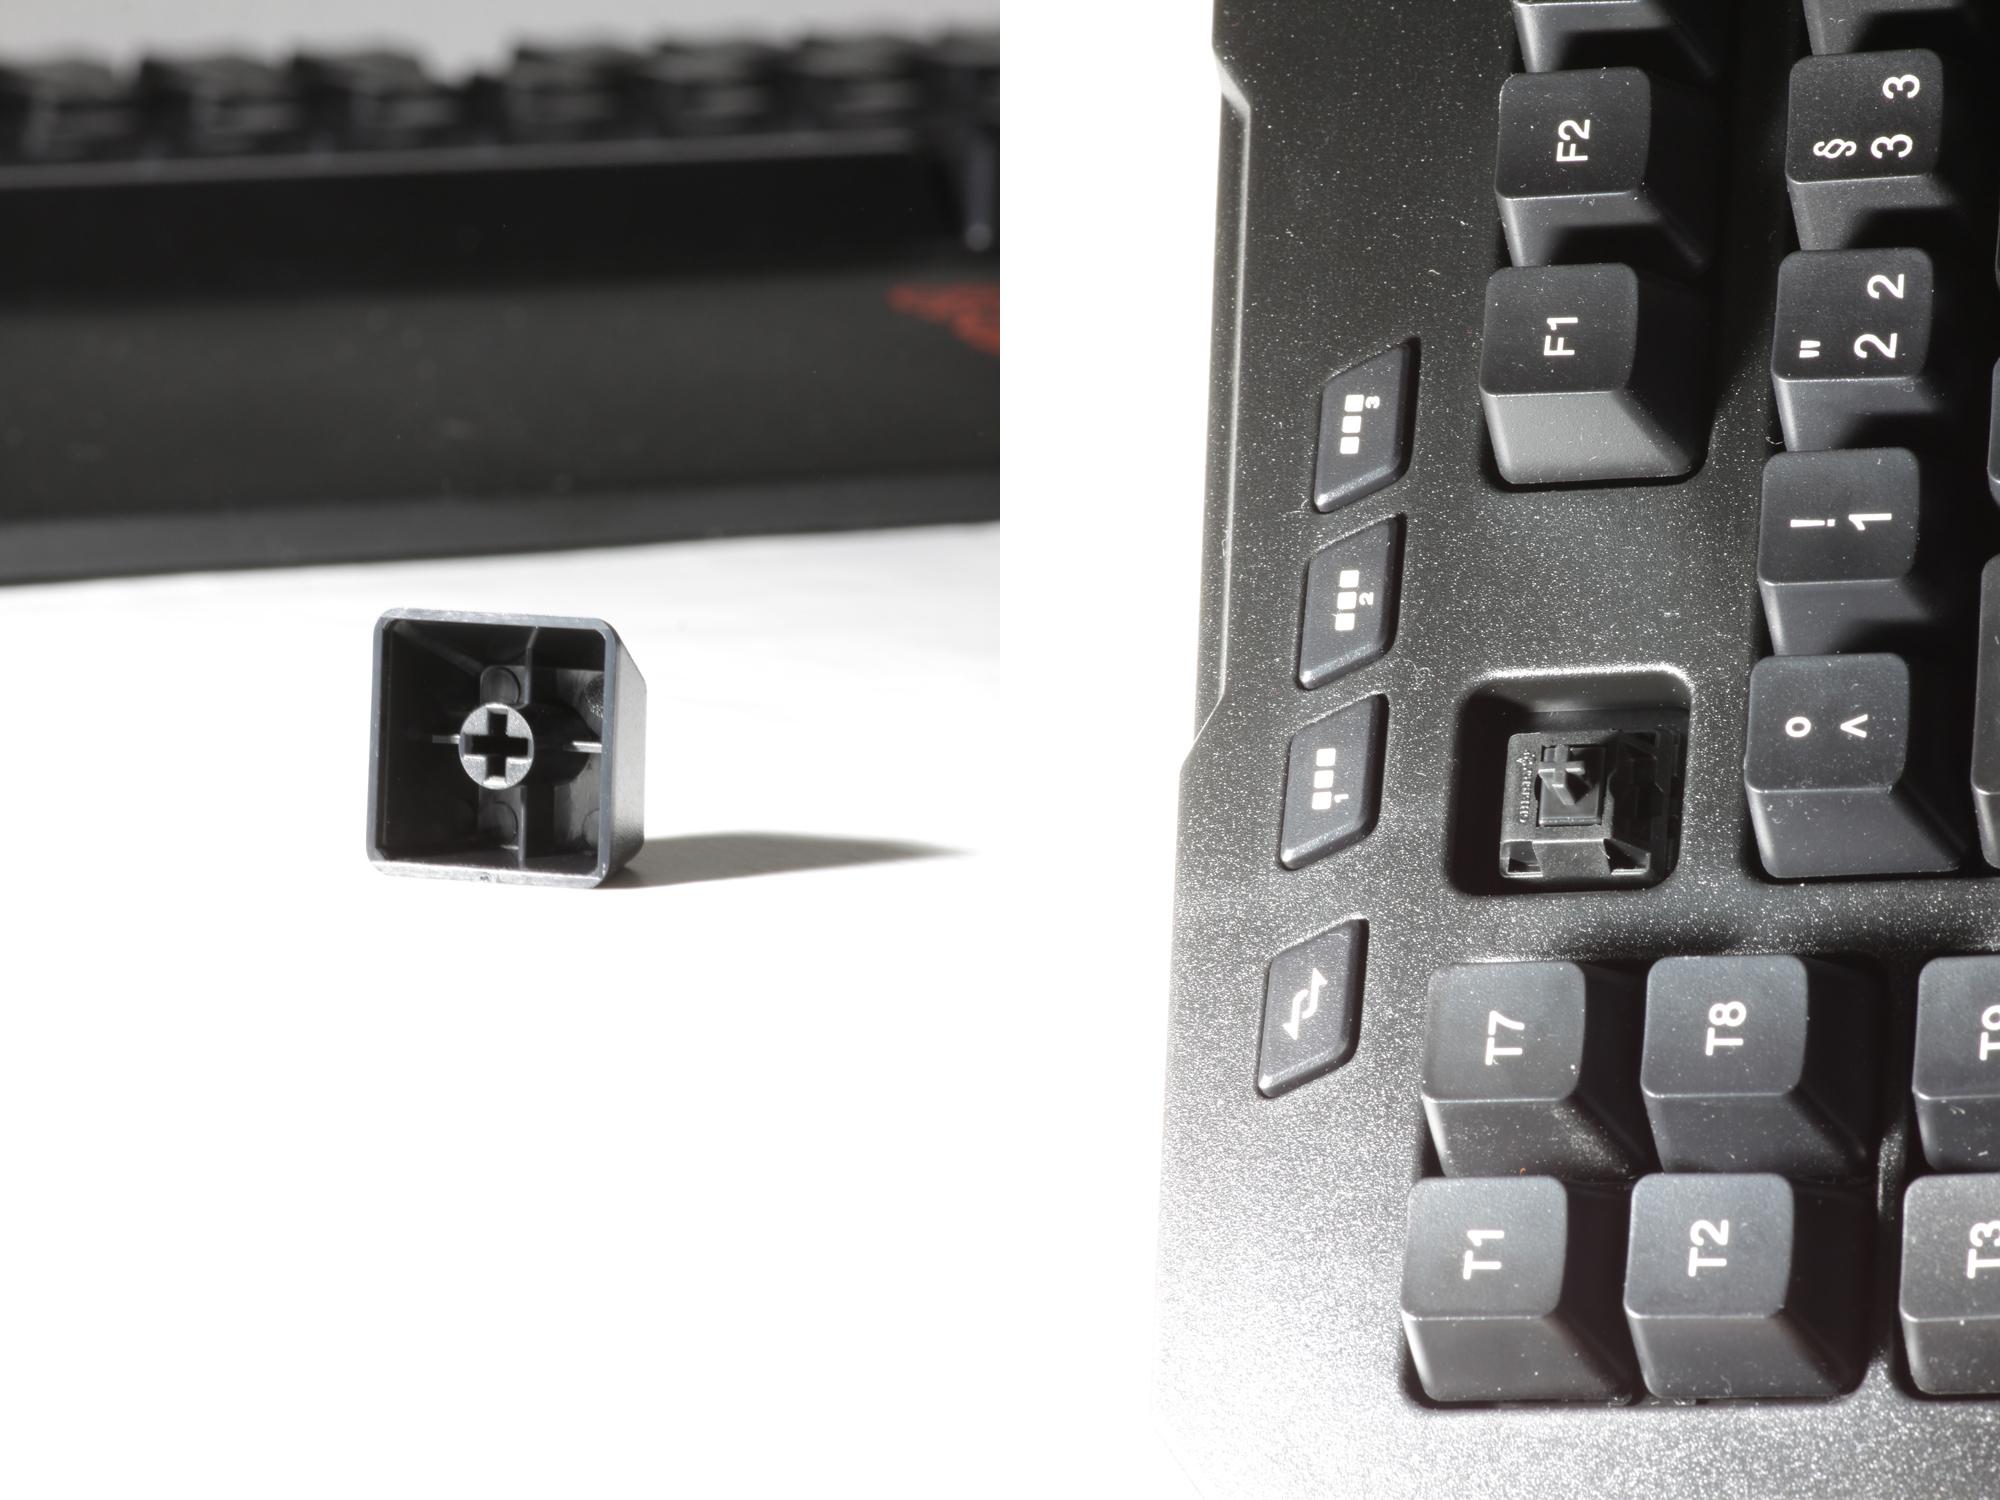 erfahrungsbericht mechanische tastatur thermaltake meka g unit. Black Bedroom Furniture Sets. Home Design Ideas